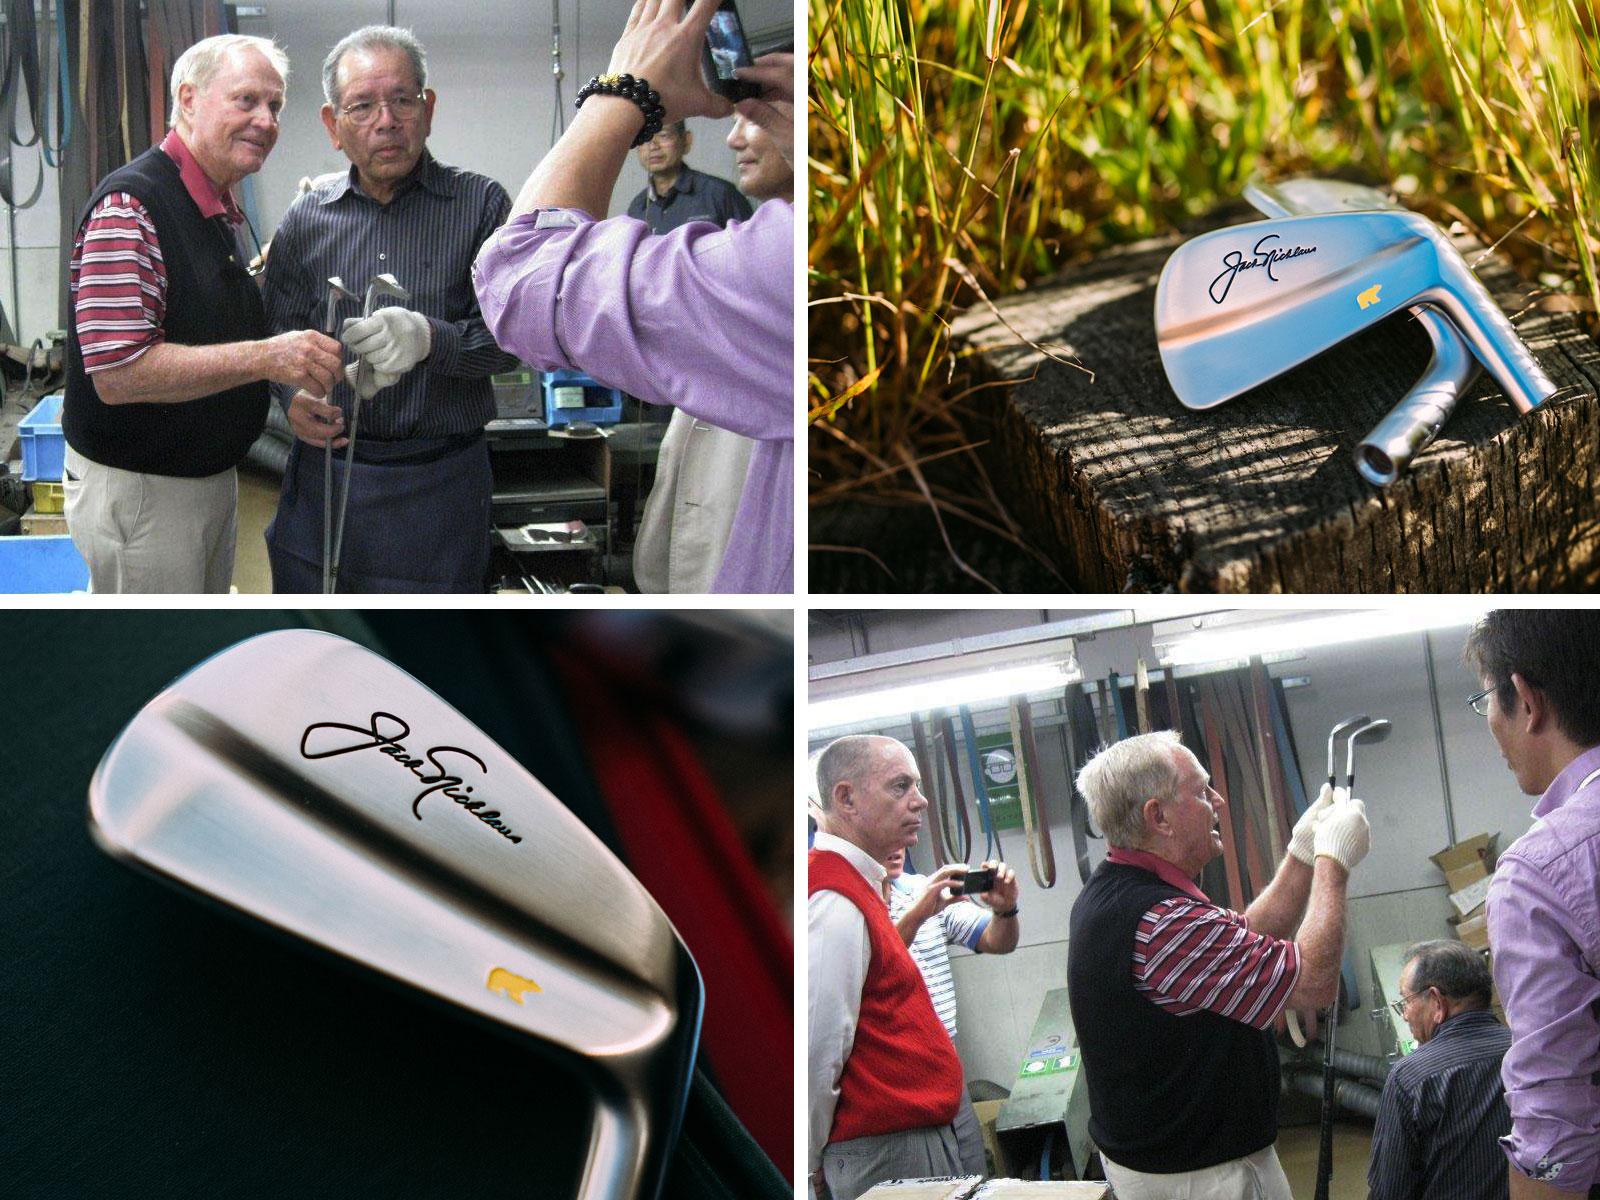 Legendary golfer, Jack Nicklaus, and legendary club-maker Katsuhiro Miura